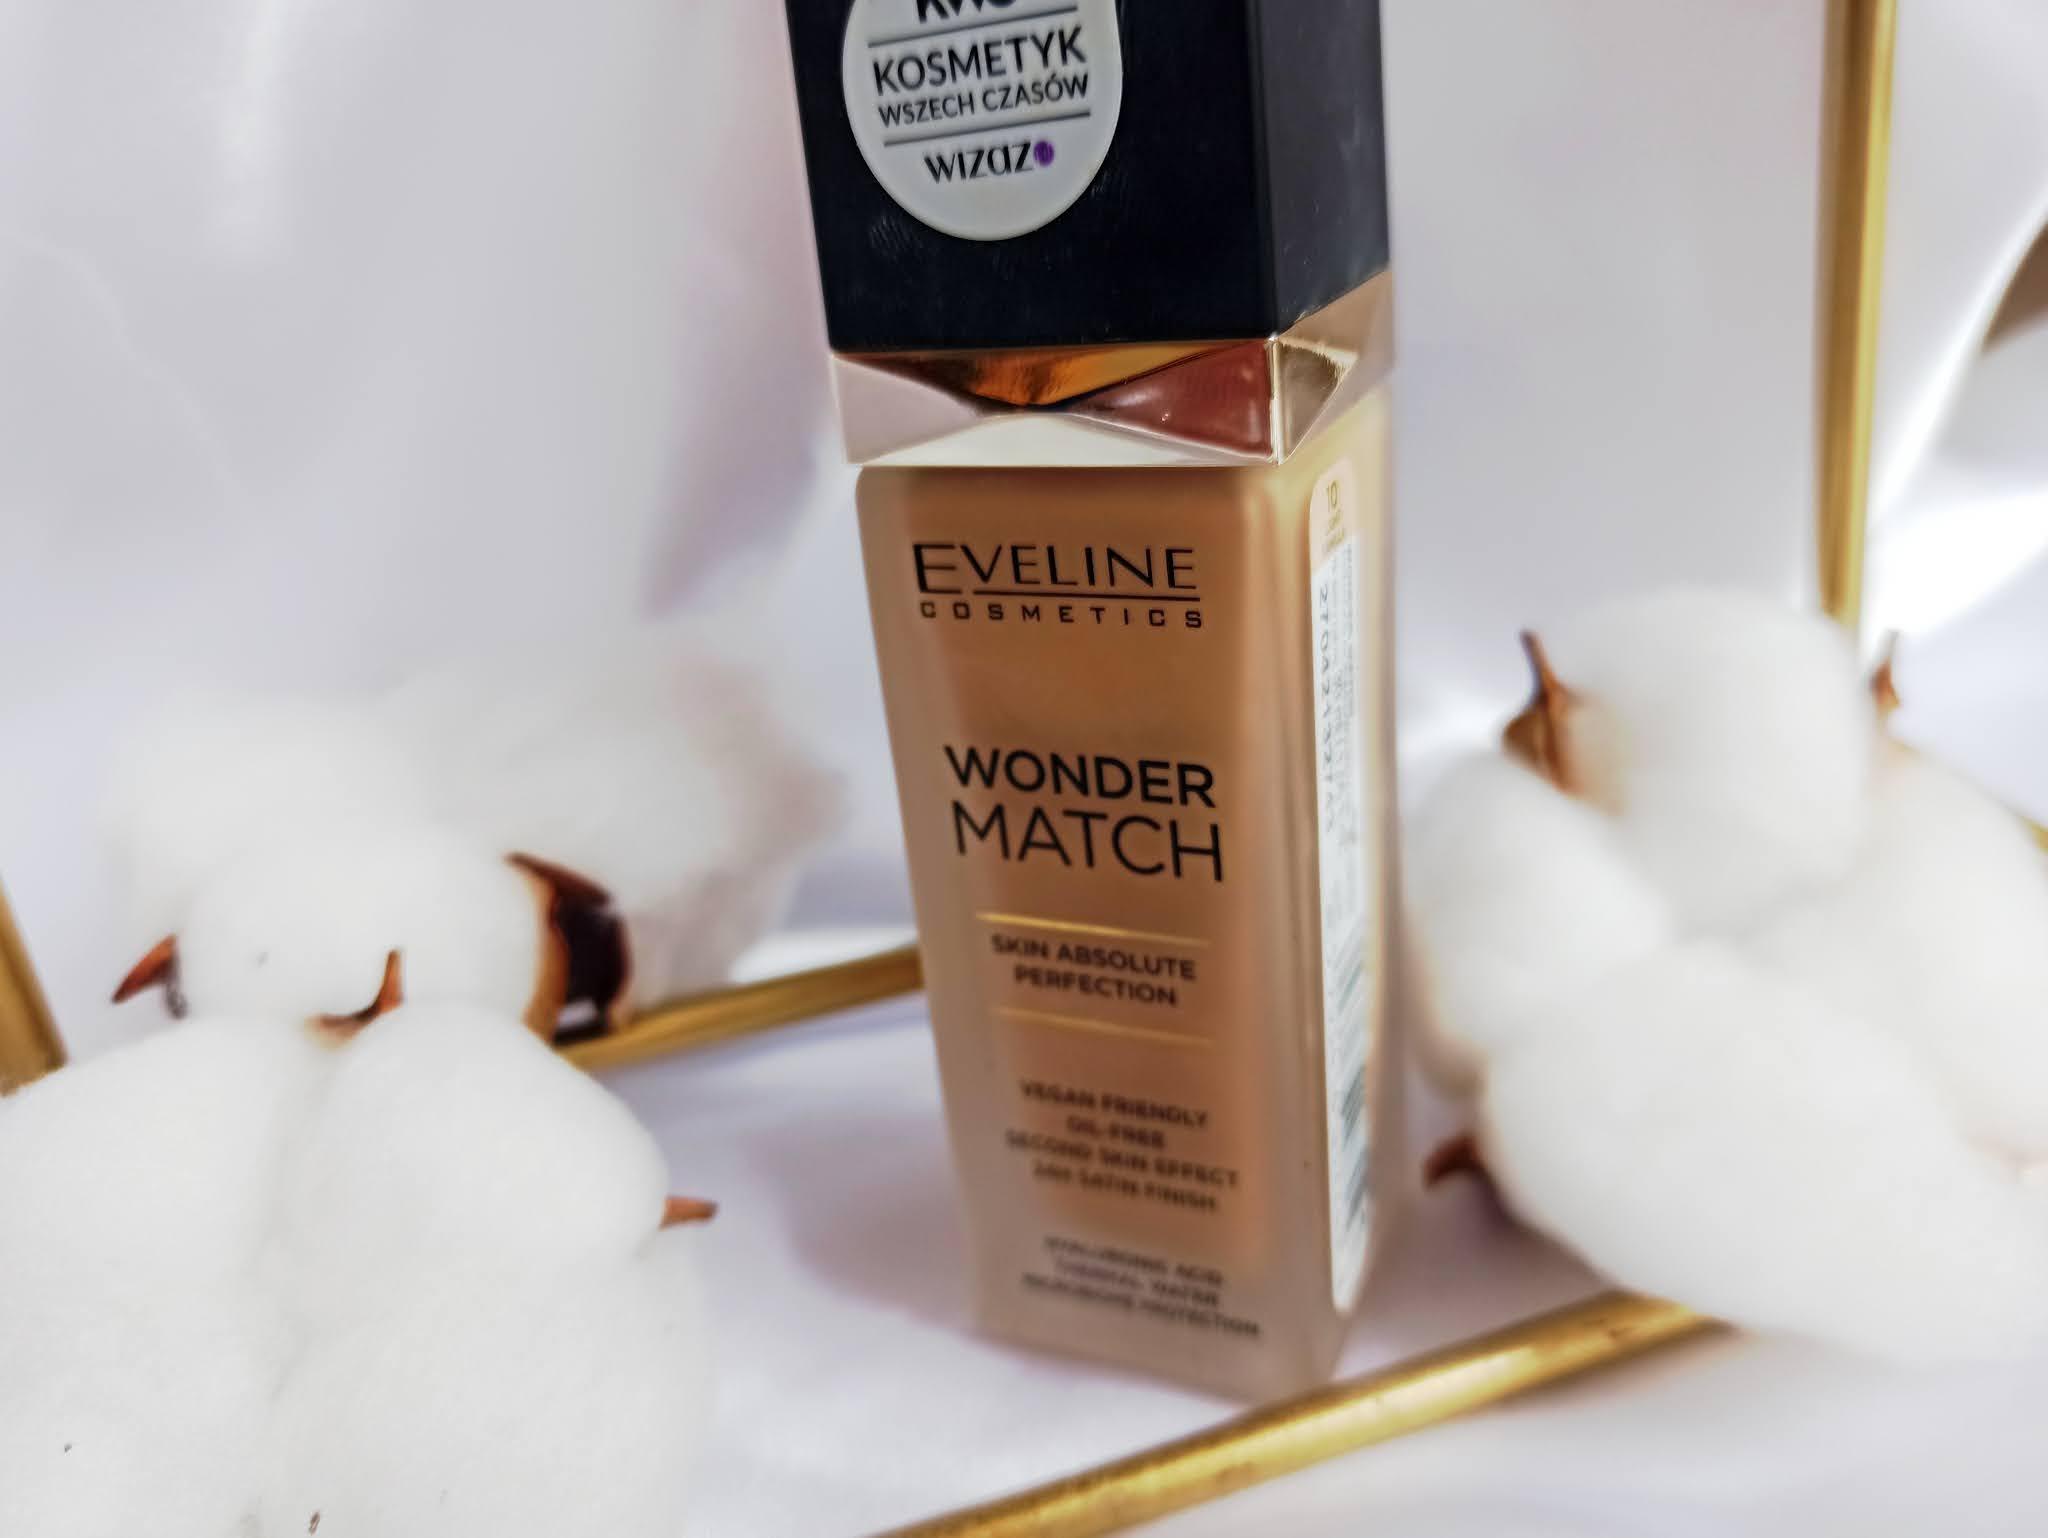 Podkład Eveline Wonder Match - recenzja, opinie